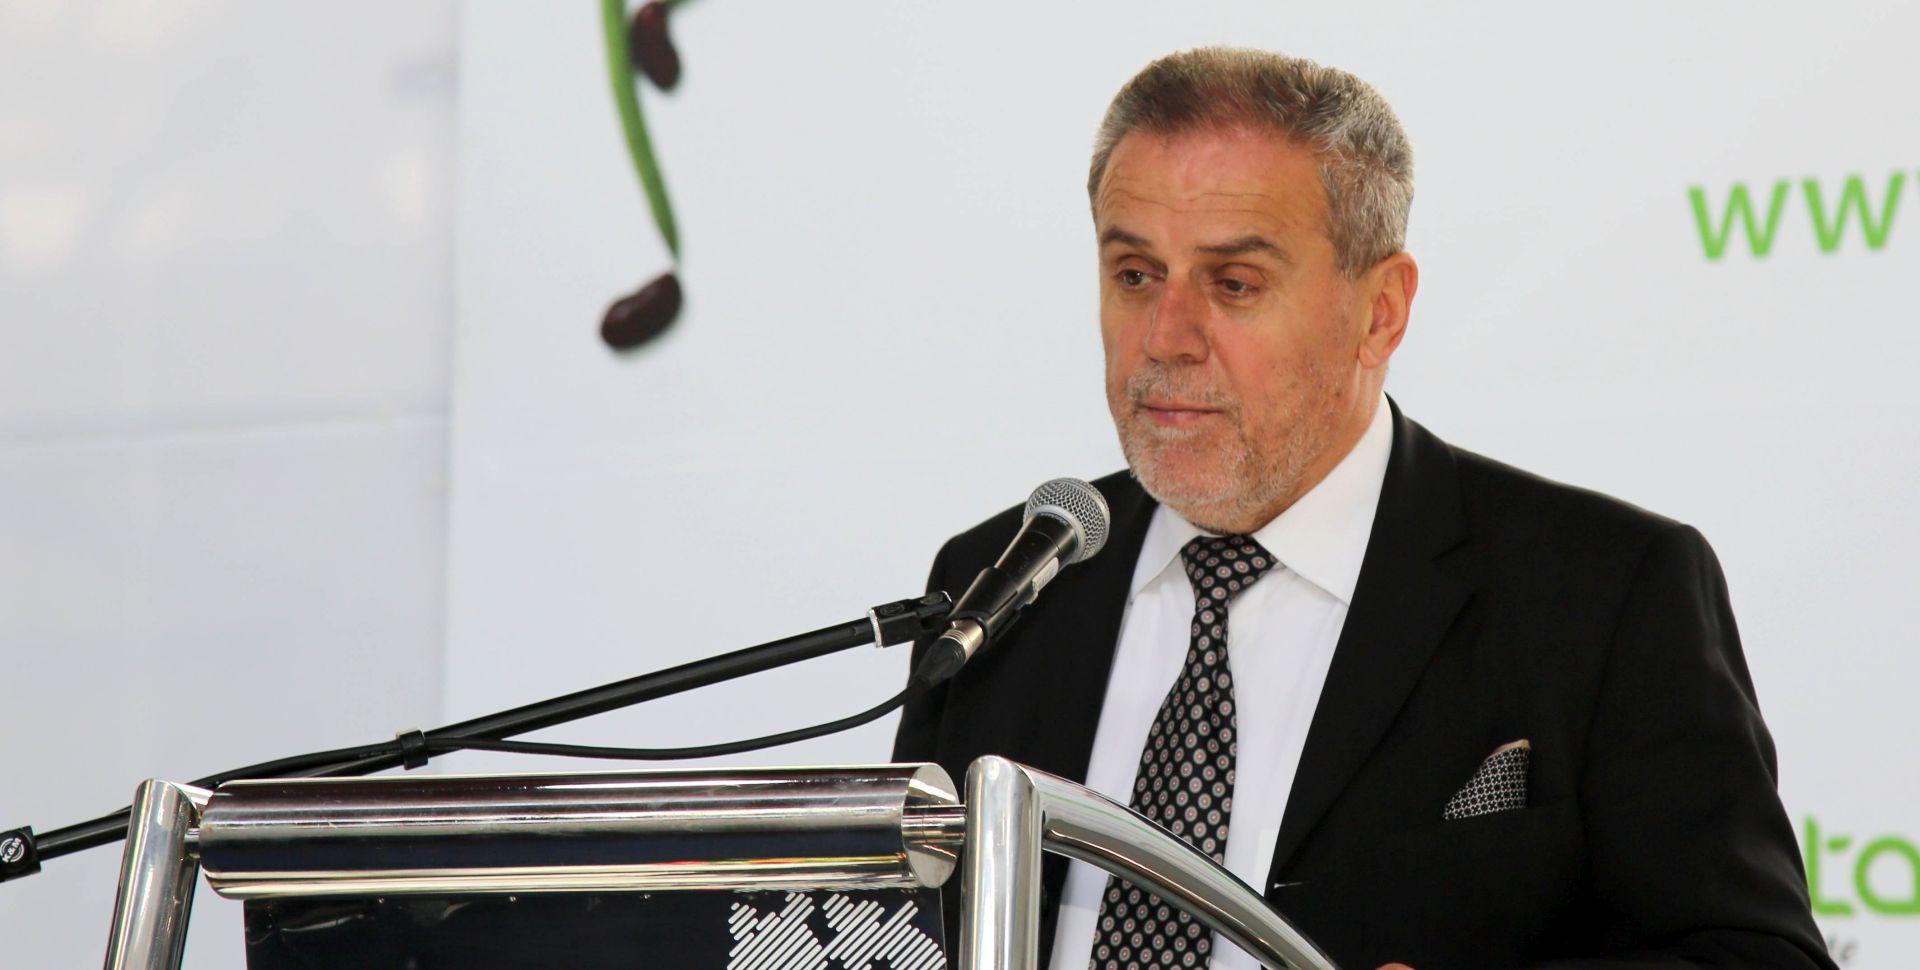 AGRAM Potvrđeno sedam od 10 točaka optužnice protiv Bandića